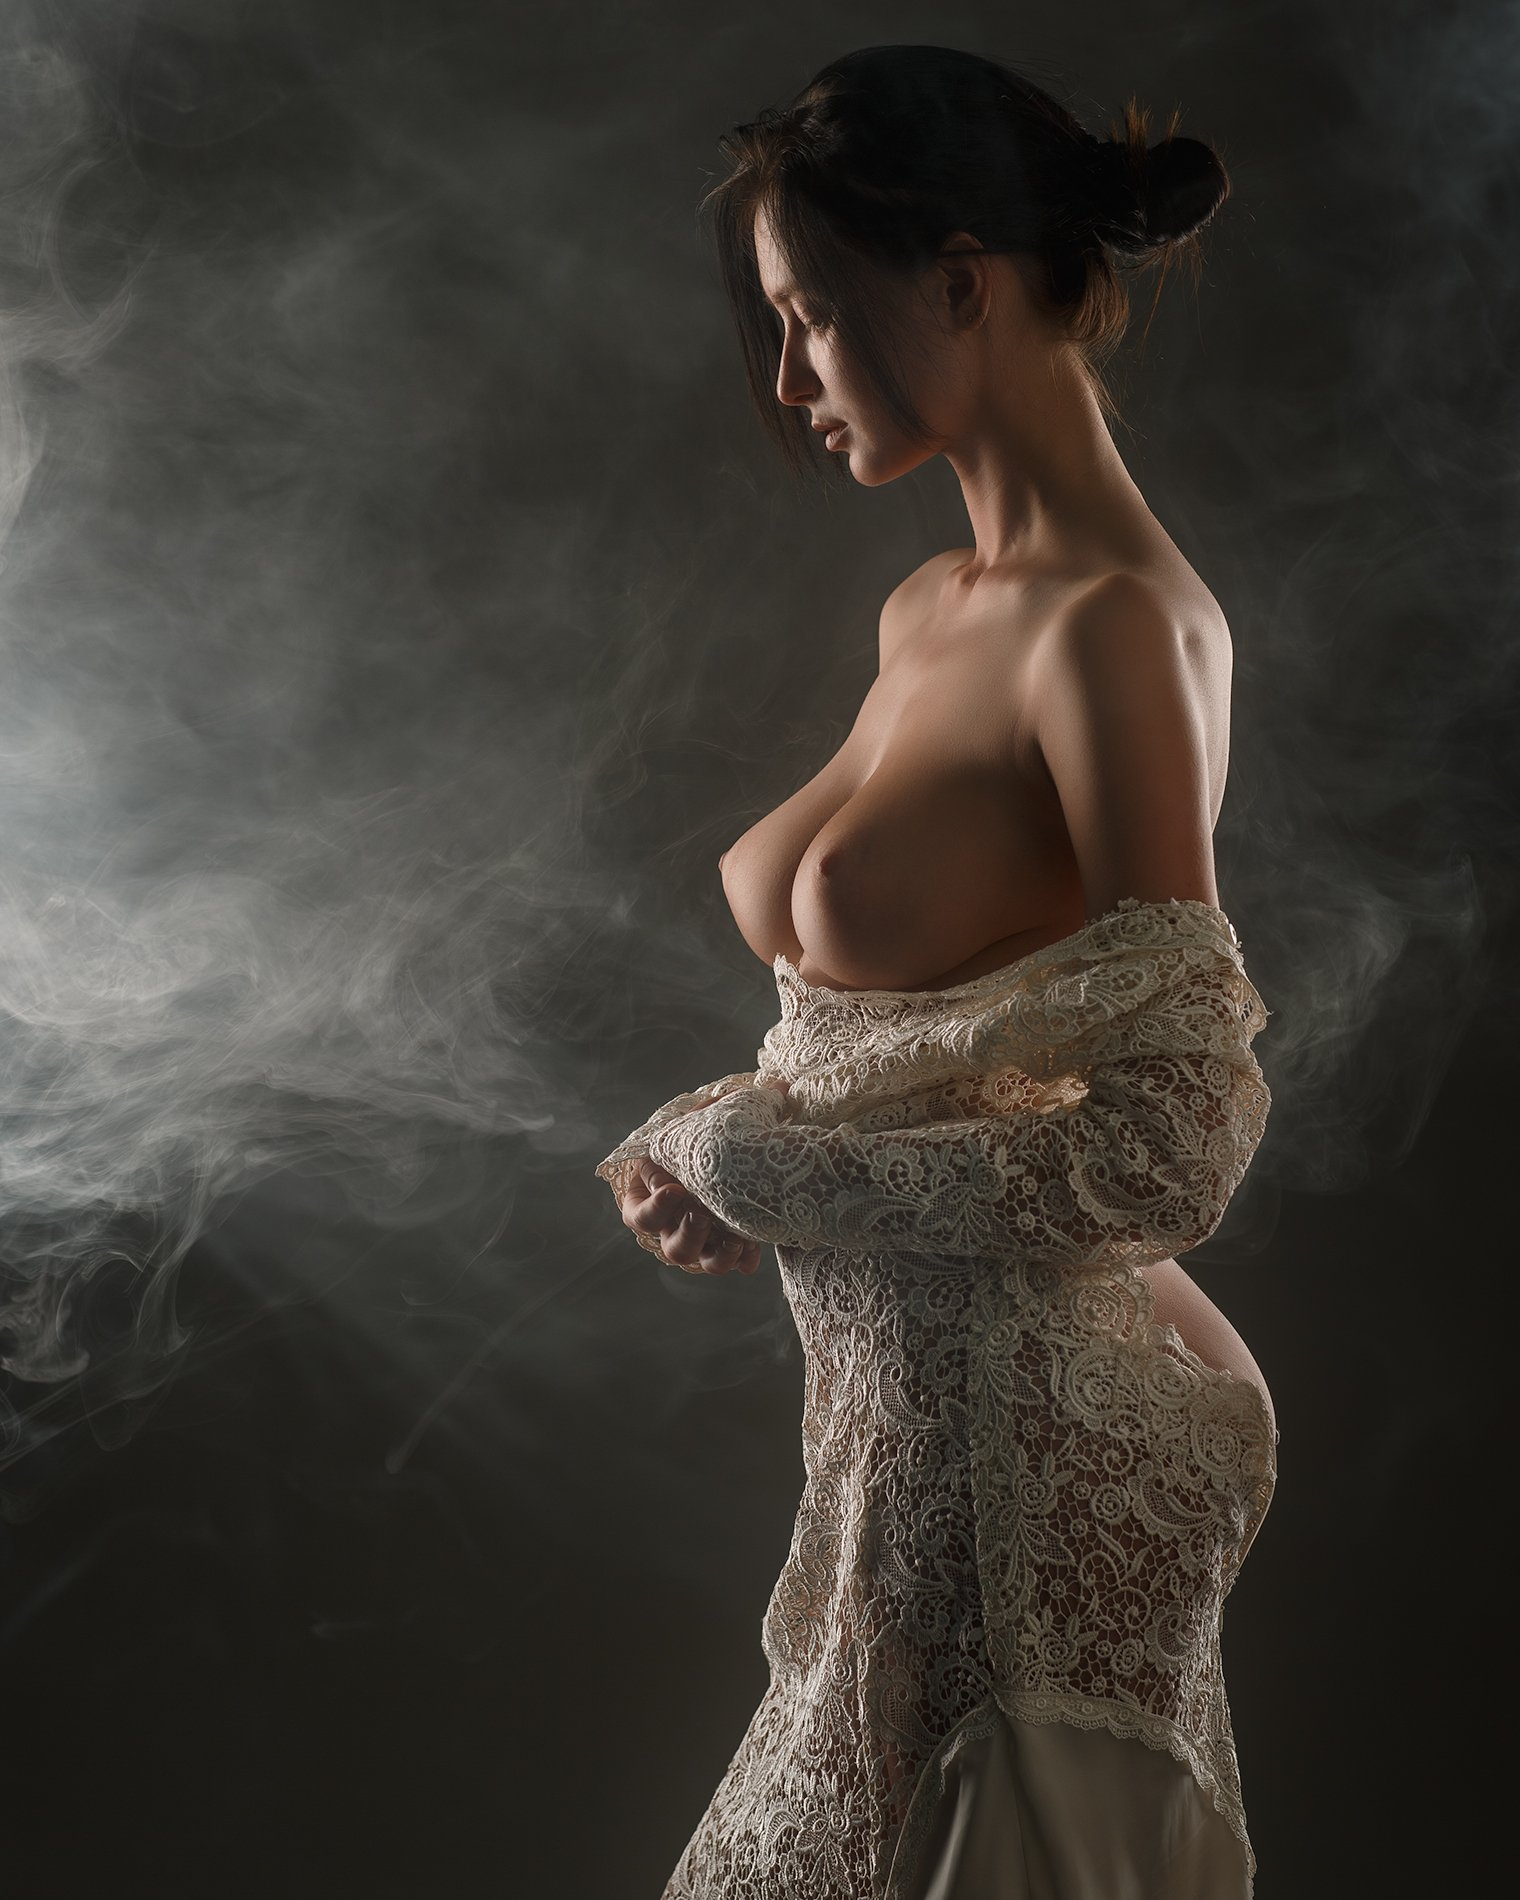 sexy girl body sensual smoke erotic, Сергей Сорокин